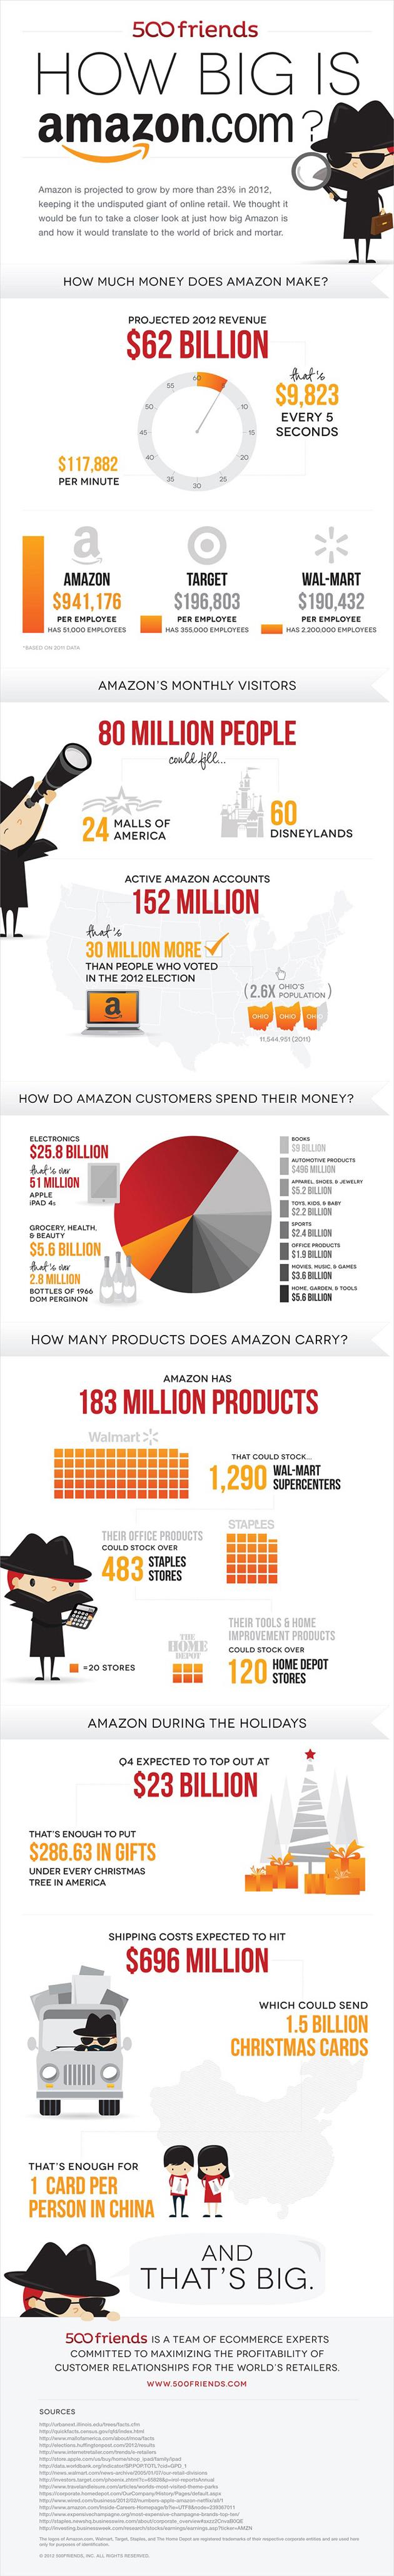 2. Just how big is Amazon.com